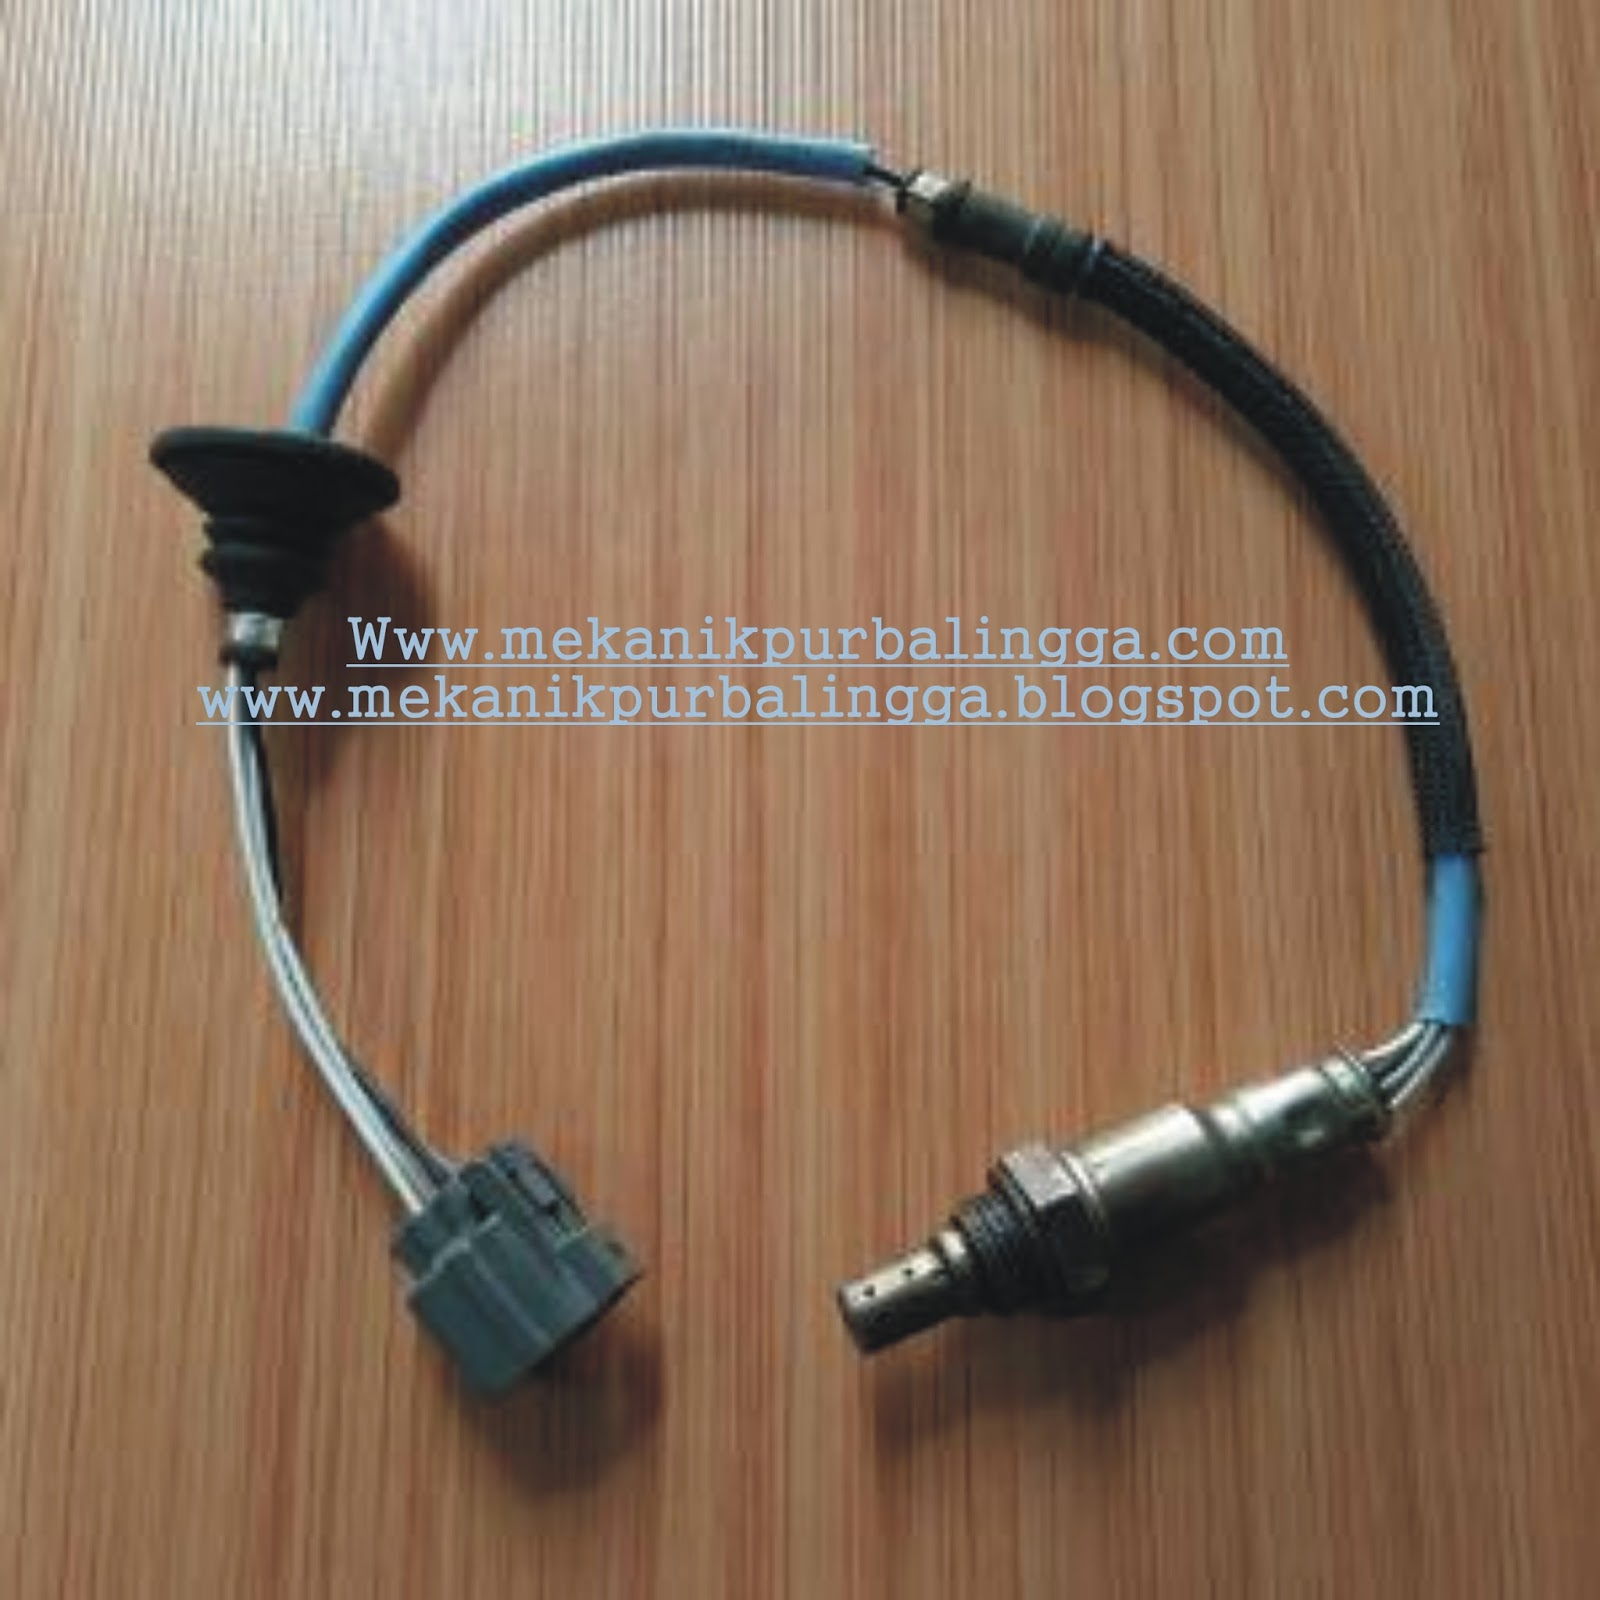 o2 sensor heater clipsal 2 way light switch wiring diagram mekanik purbalingga cara mengatasi dtc p0141